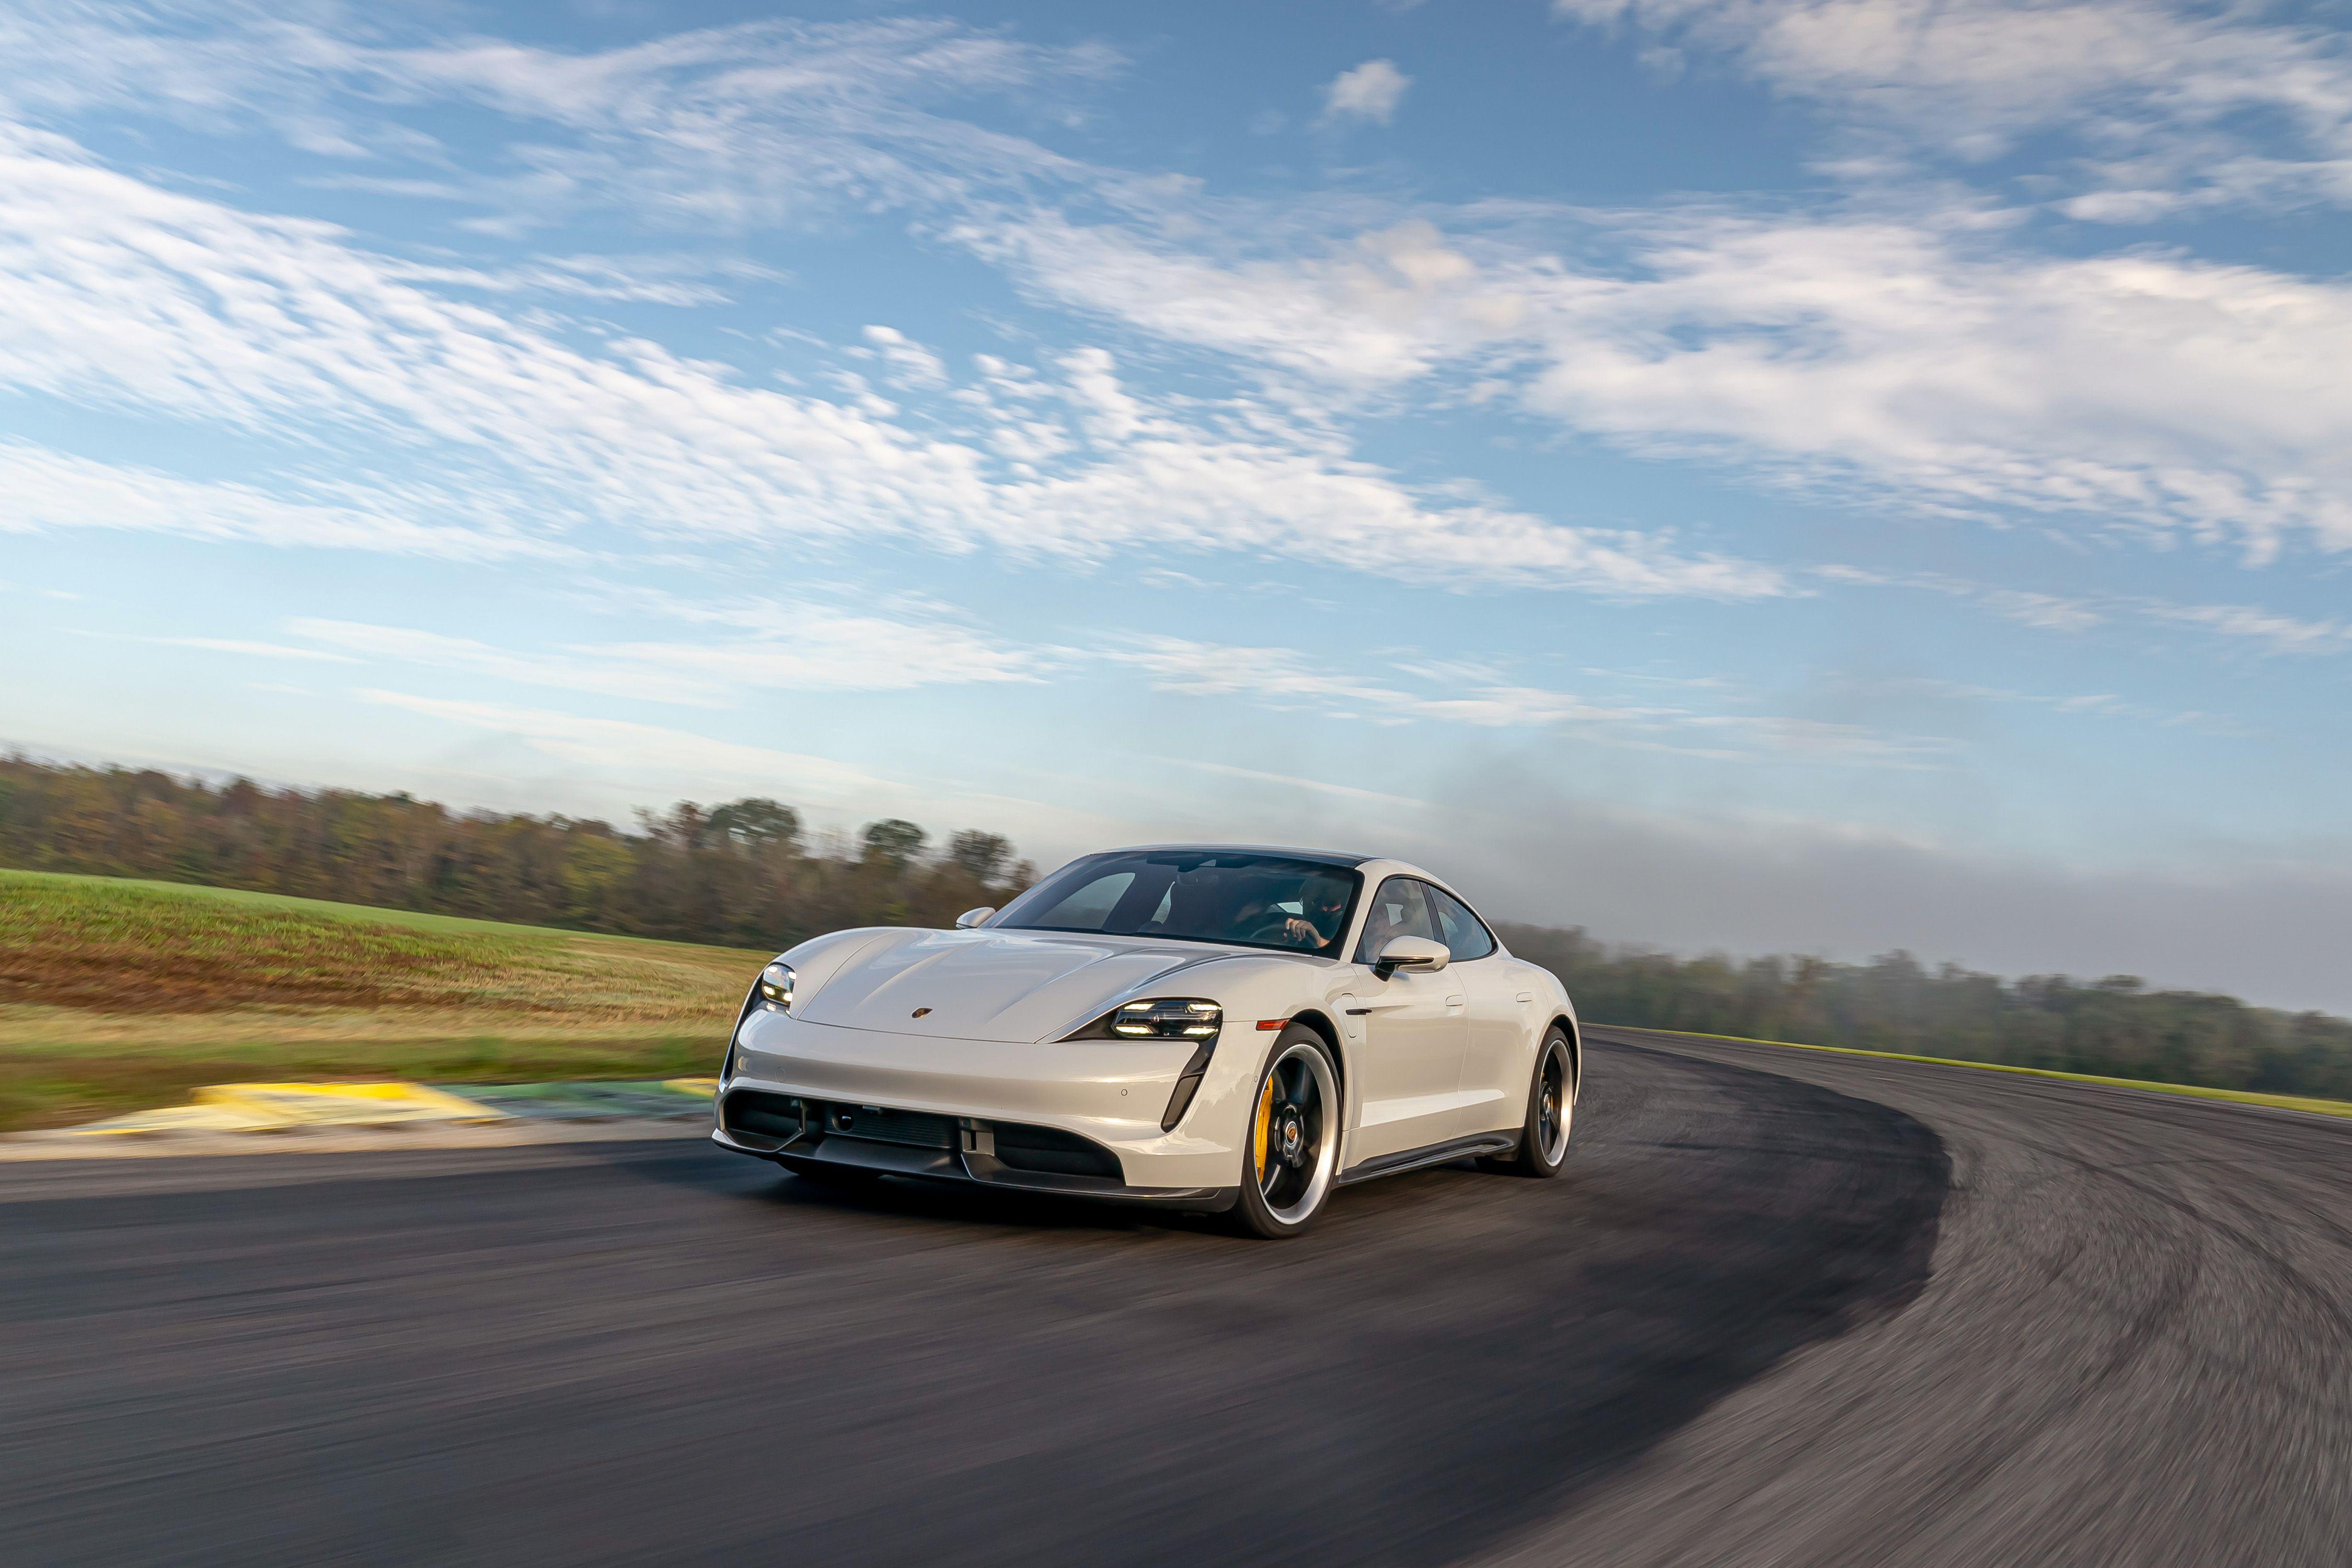 2020 Porsche Taycan Turbo S At Lightning Lap 2021